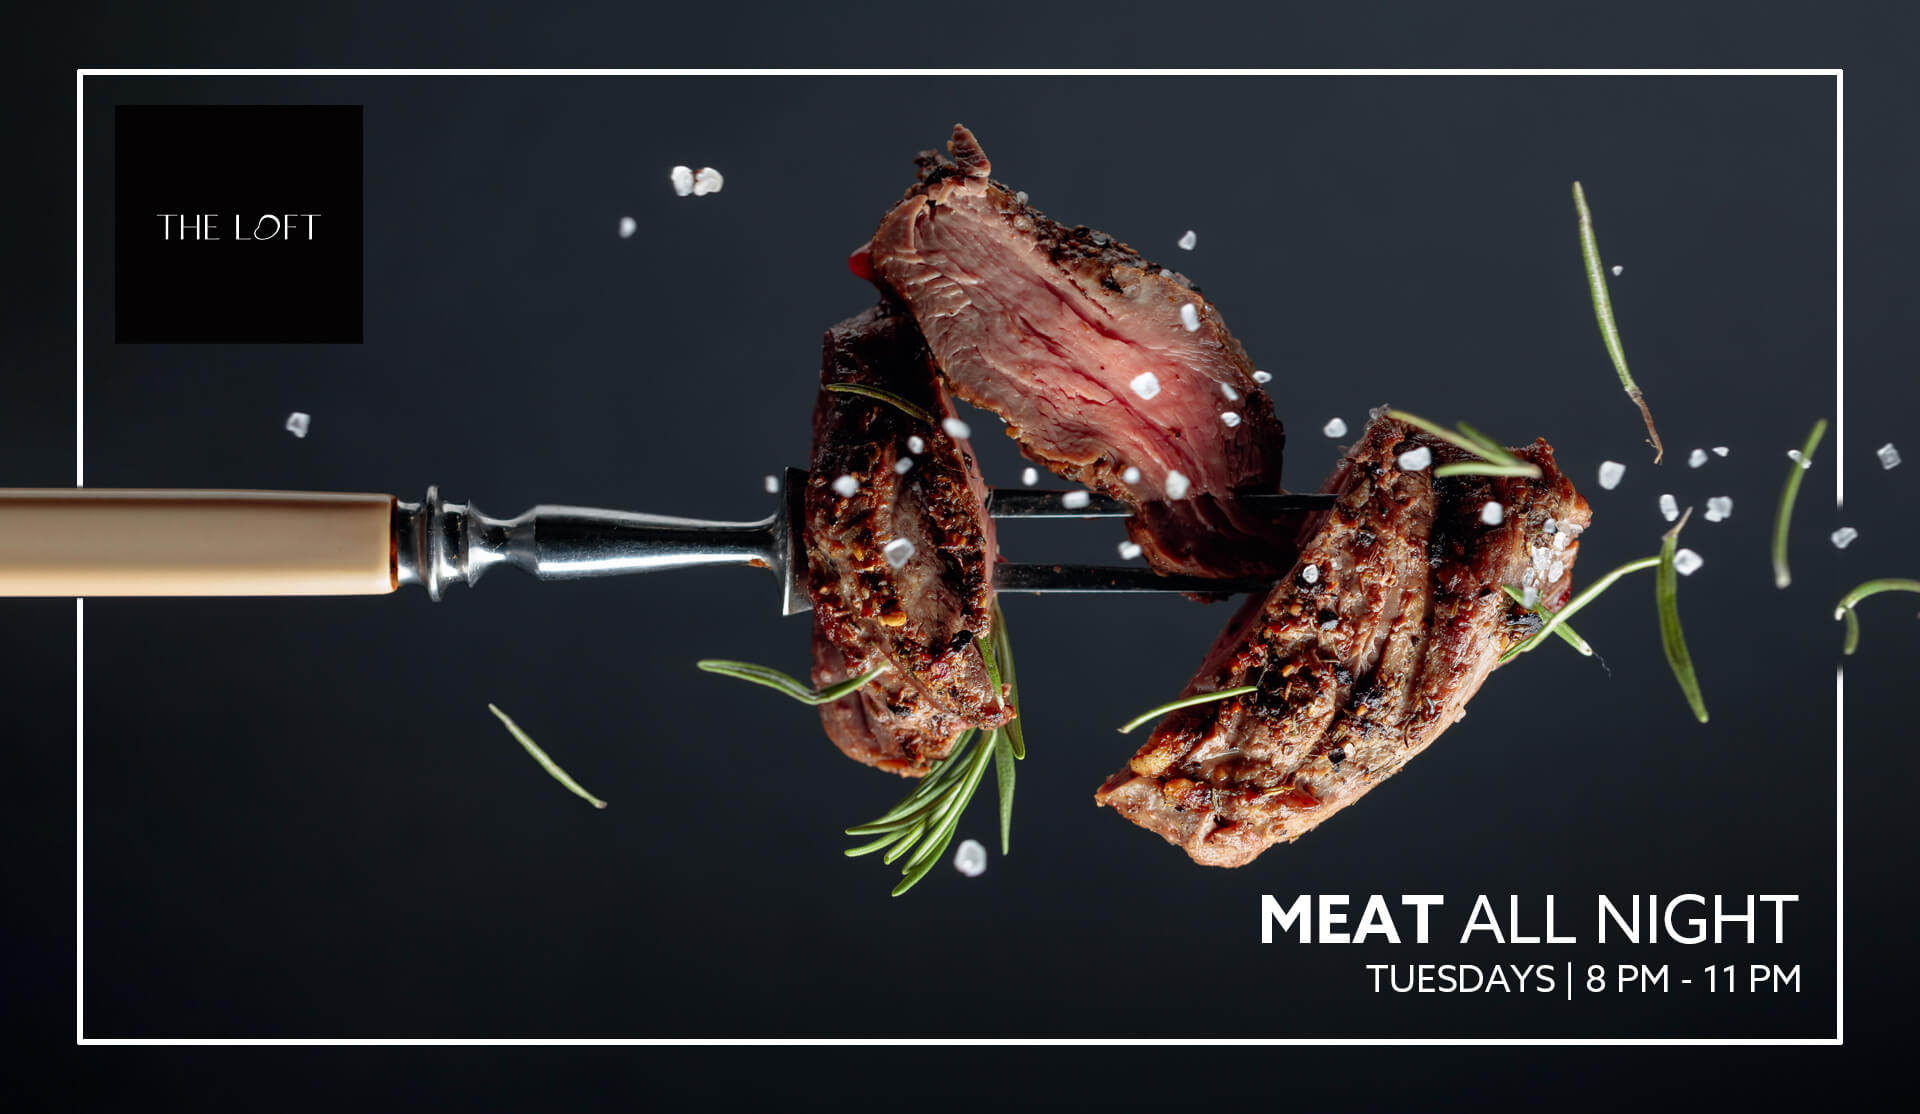 Meat All Night - The Loft at Dubai Opera